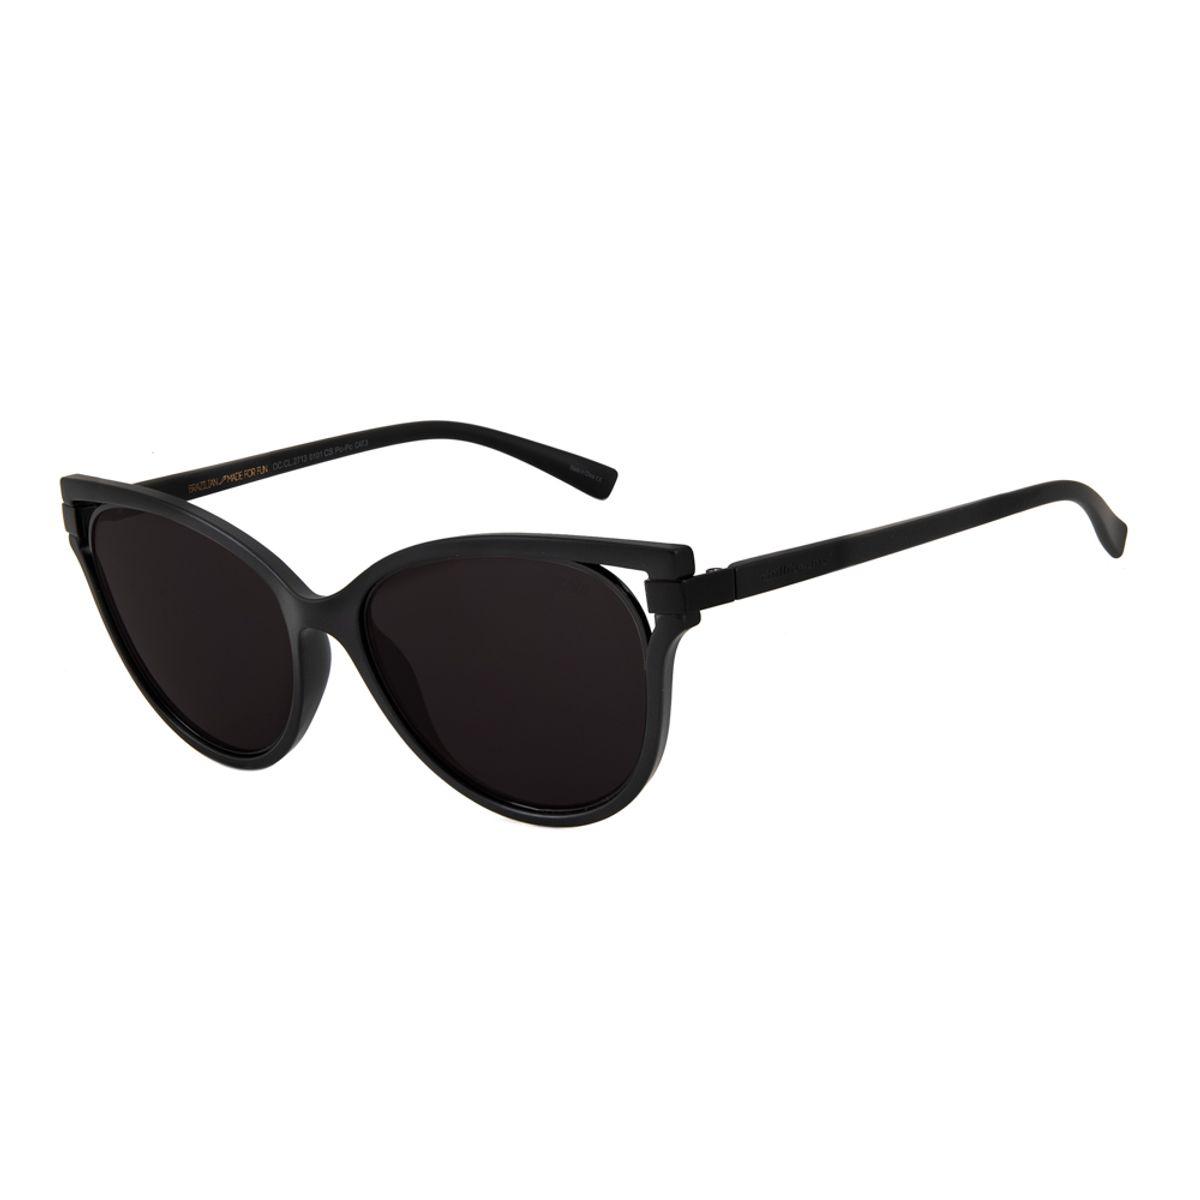 2708d5f7f2964 Óculos de Sol Feminino Chilli Beans Máxi Gatinho Preto 2713 - Chilli ...